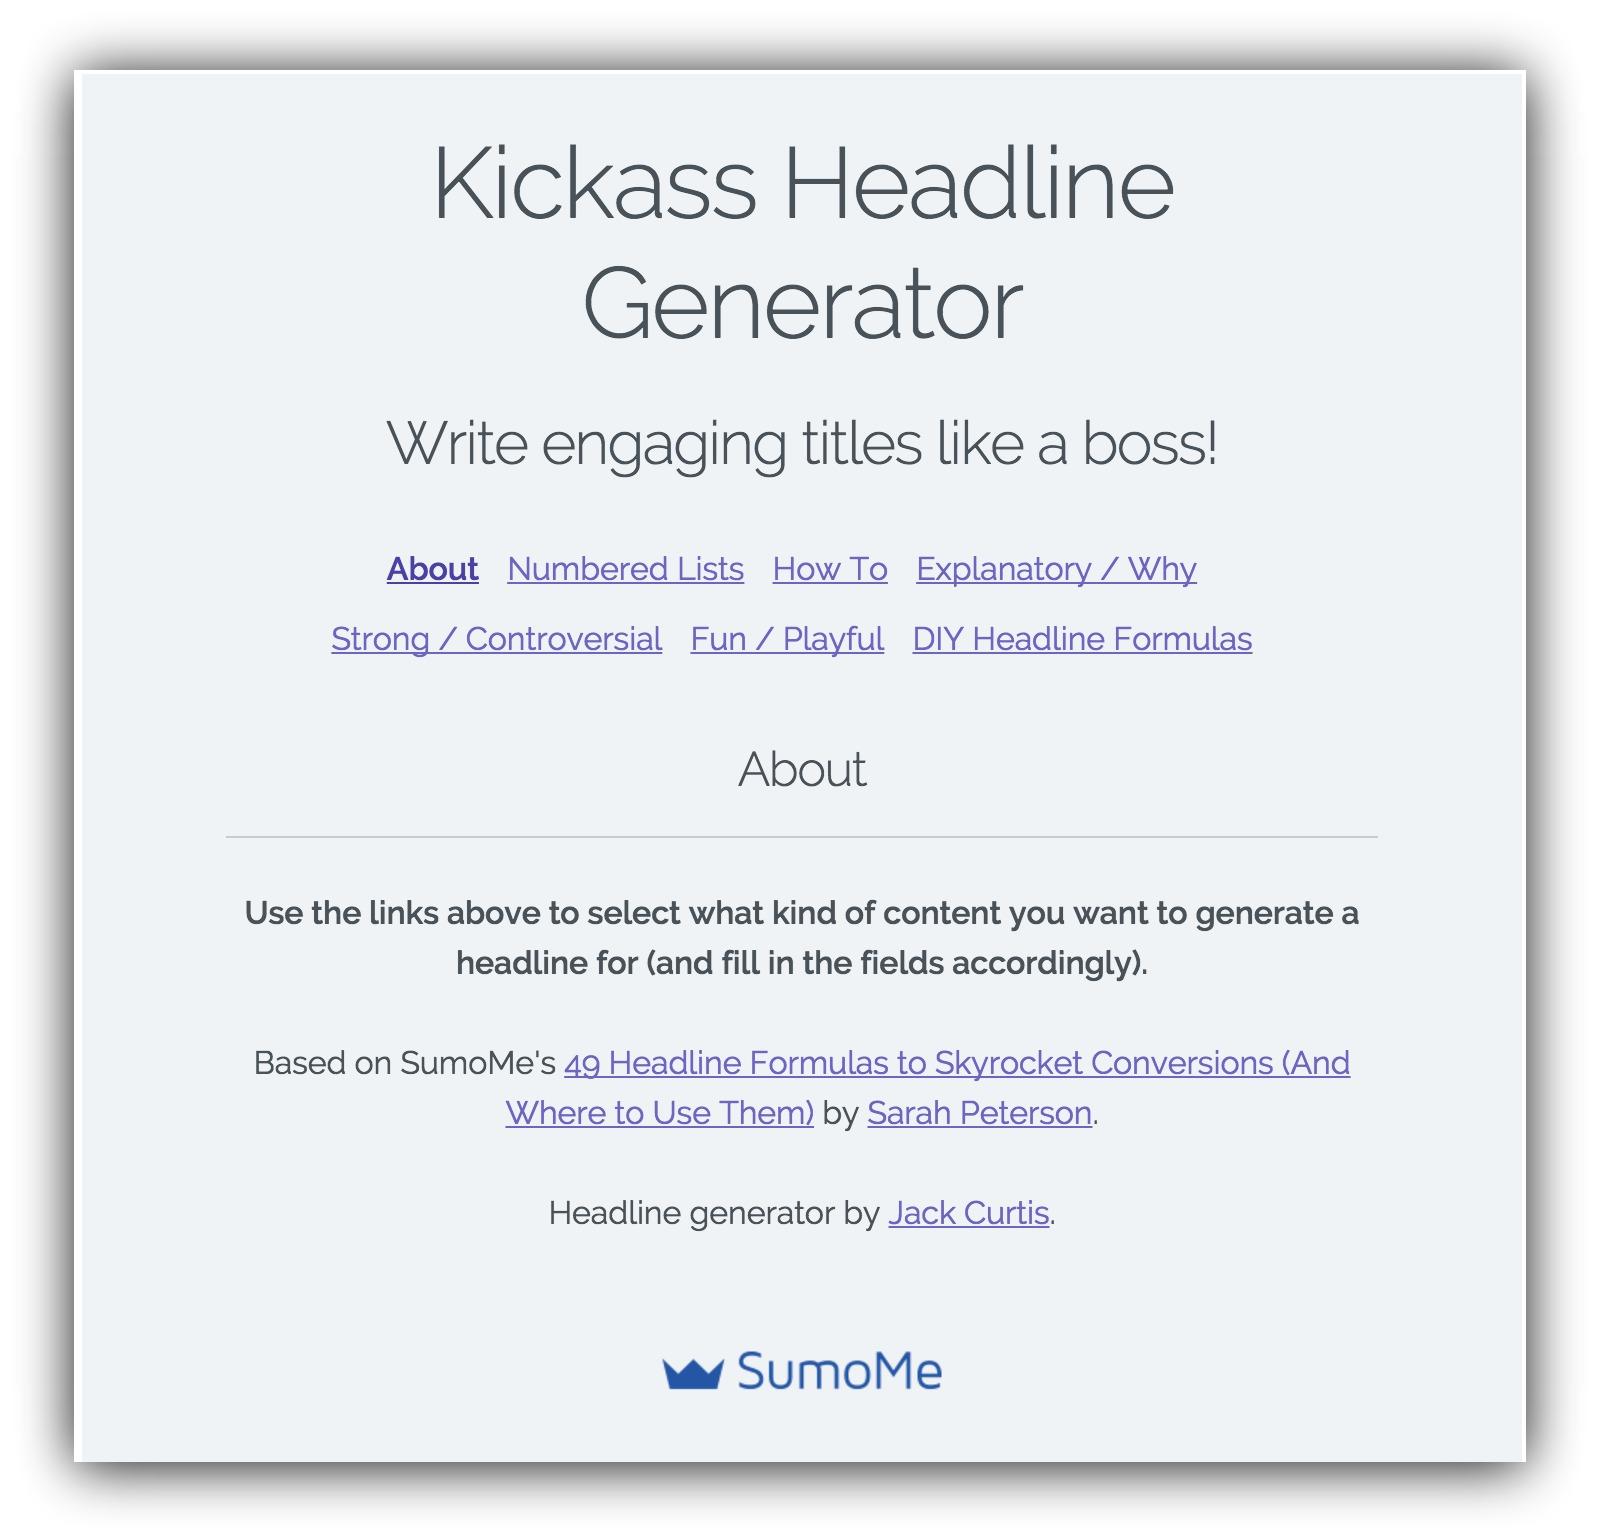 sumome kickass headline generator